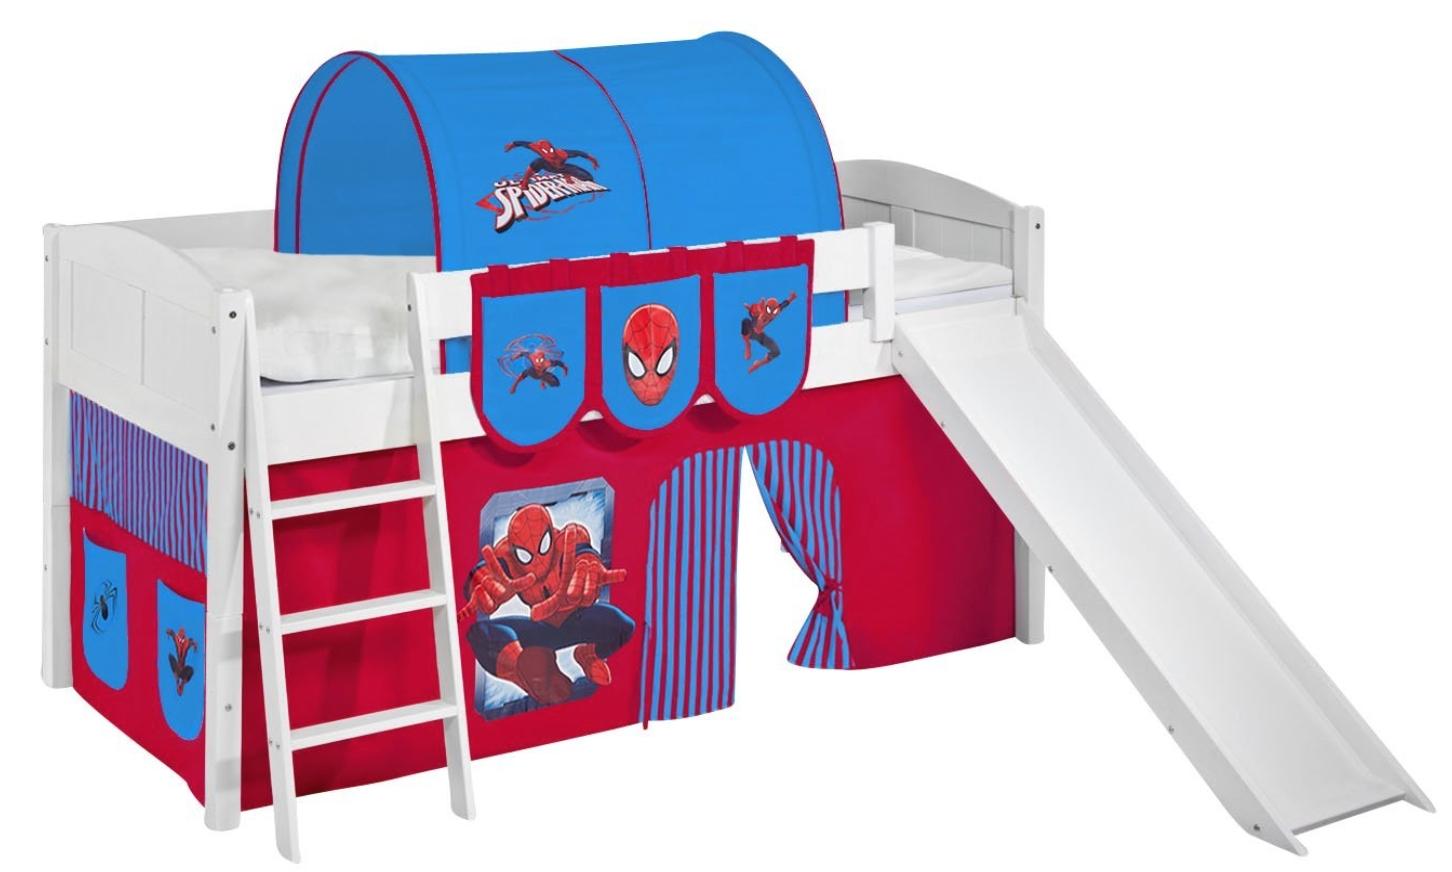 lit sur lev blanc laqu toboggan ida rideau spiderman. Black Bedroom Furniture Sets. Home Design Ideas